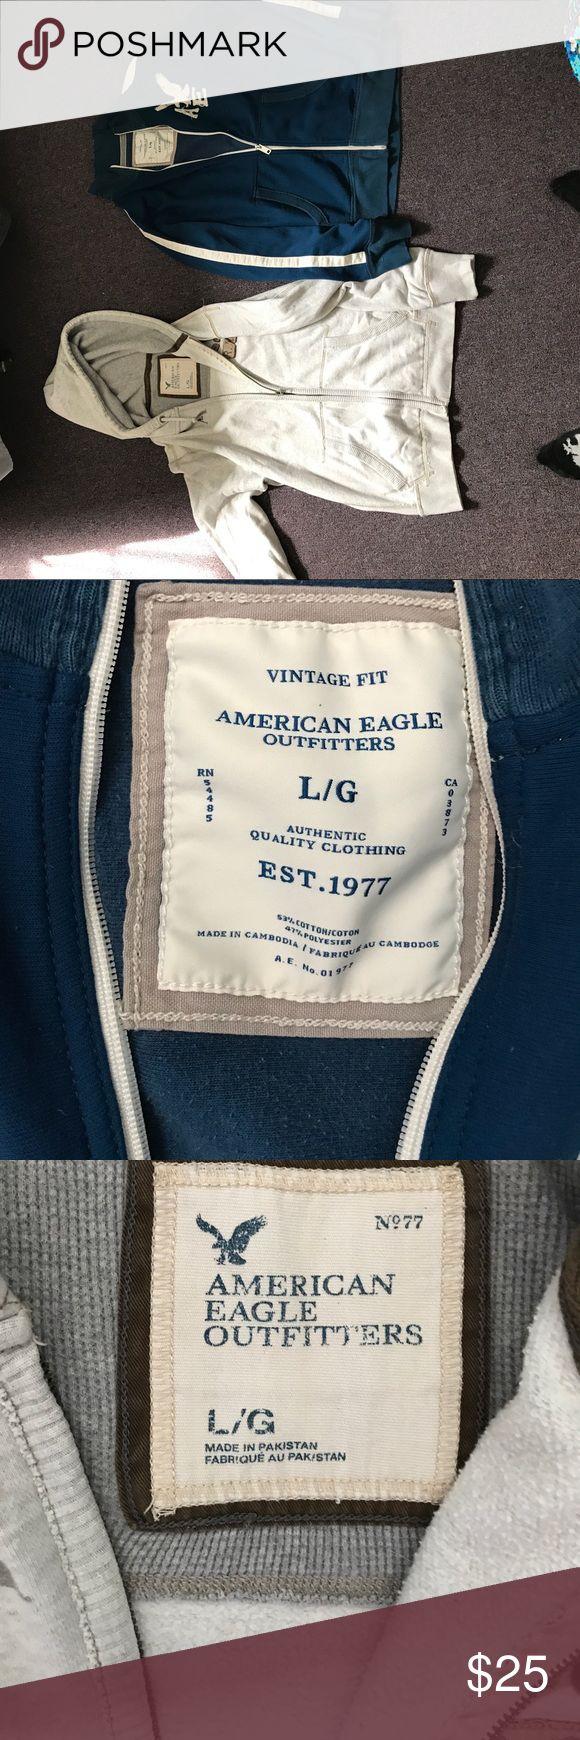 American Eagle sweatshirt bundle Size large sweatshirt bundle. Good condition make an offer American Eagle Outfitters Shirts Sweatshirts & Hoodies